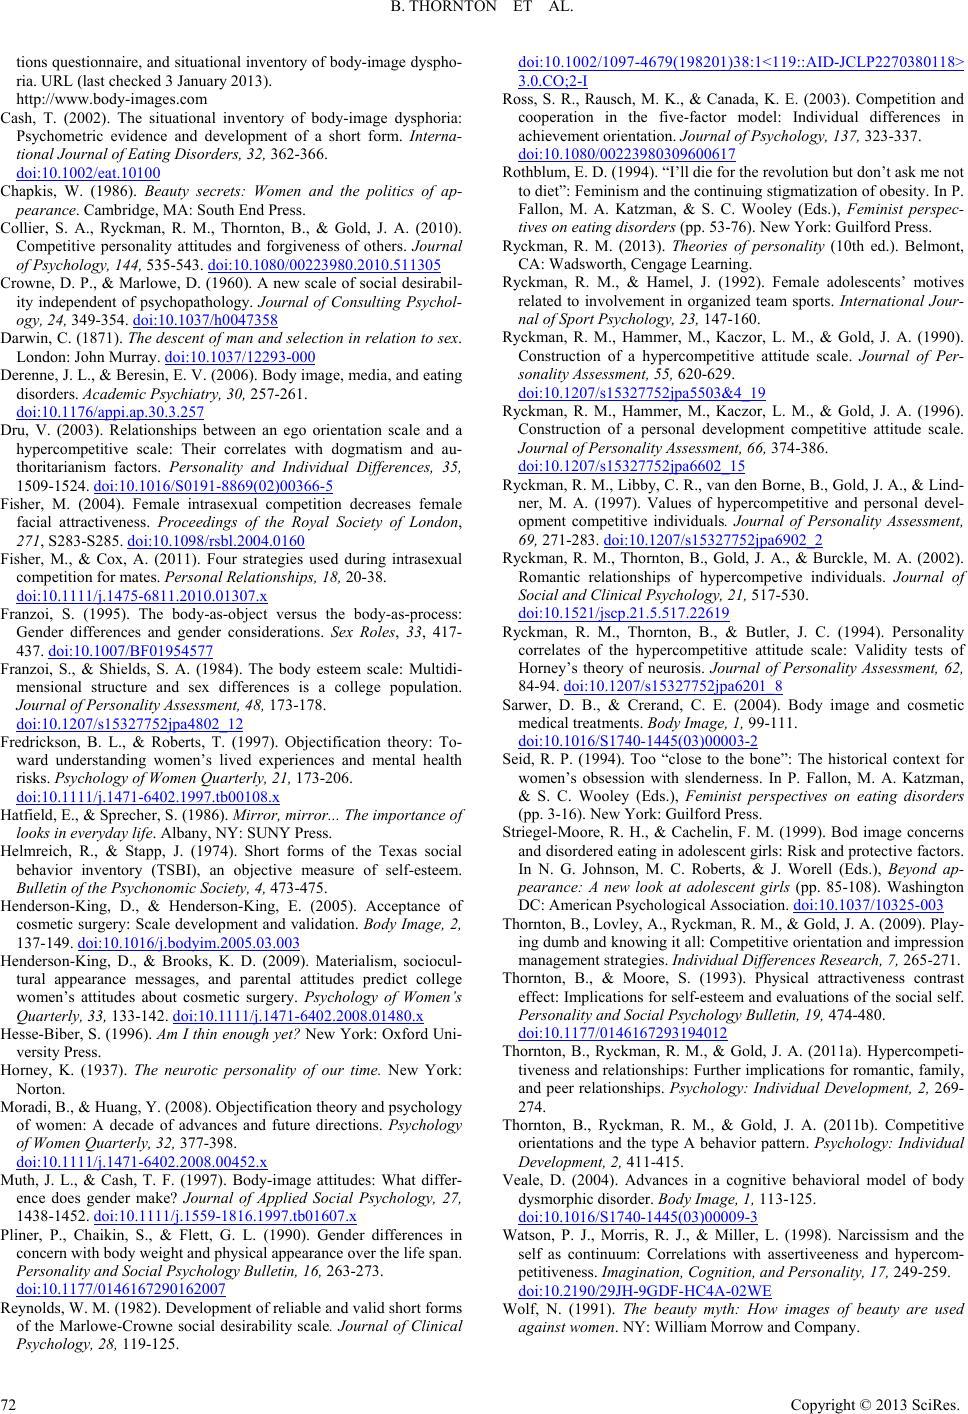 coping strategies inventory short form pdf